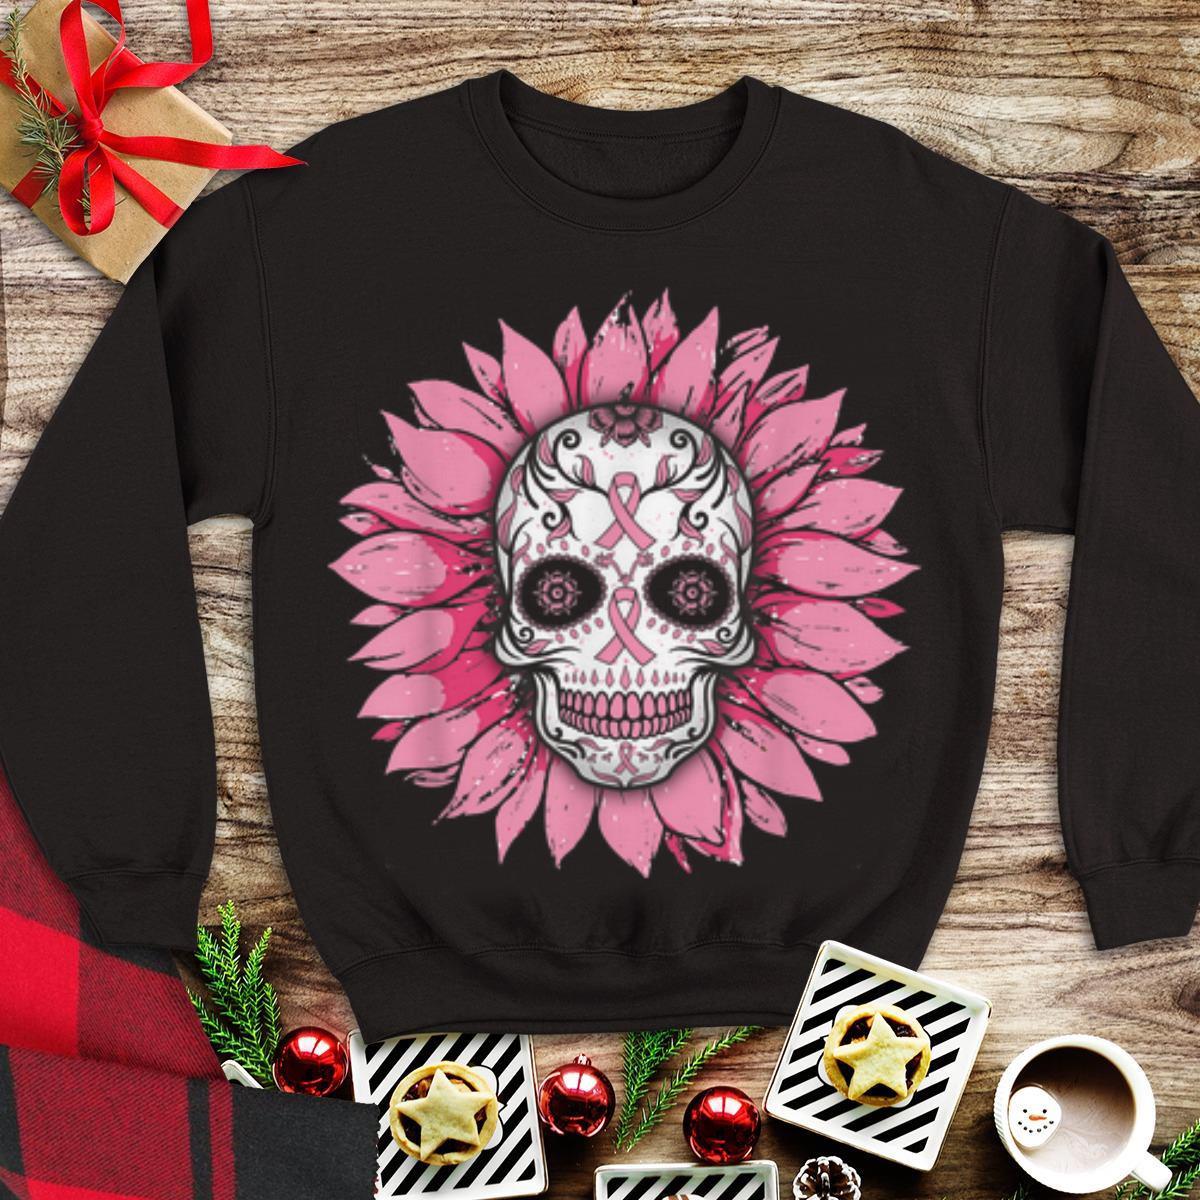 Awesome Sunflower Breast Cancer Awareness Sugar Skull Shirt 1 1.jpg